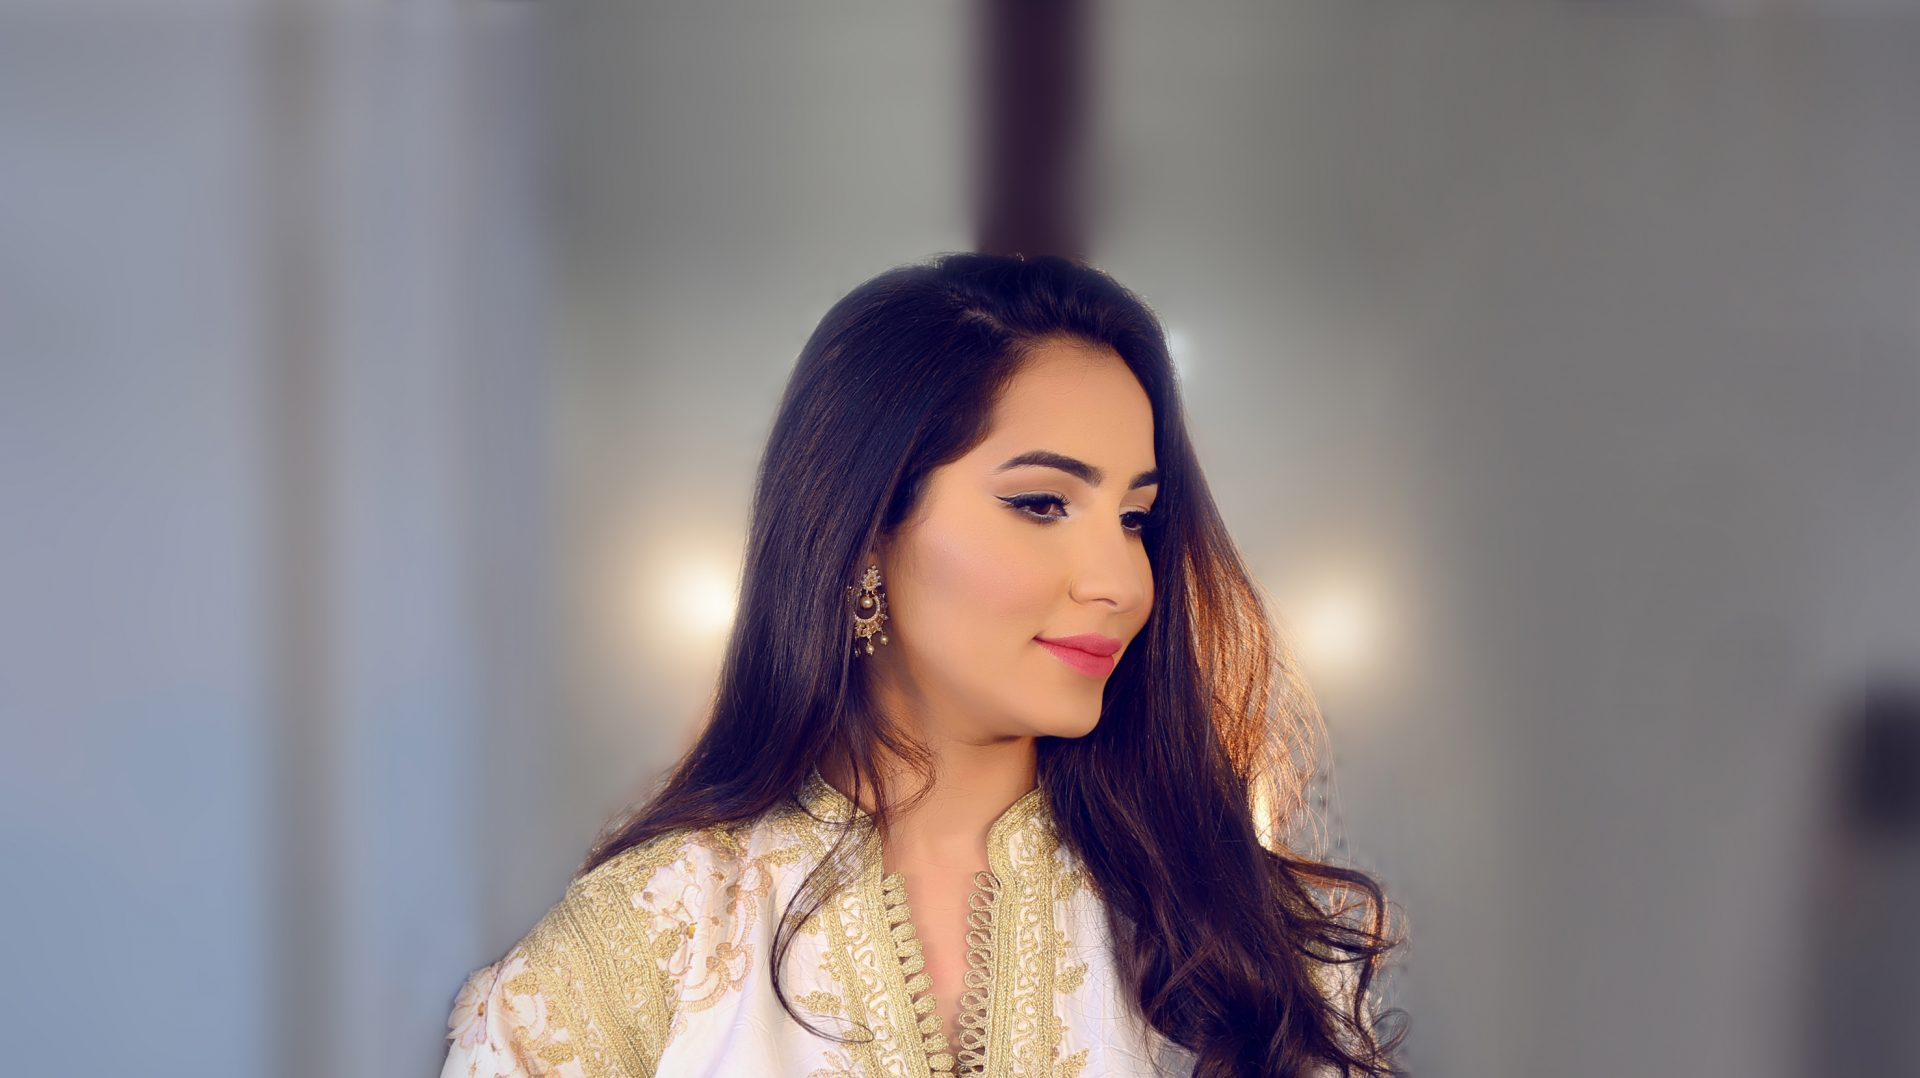 Zainab Afailal